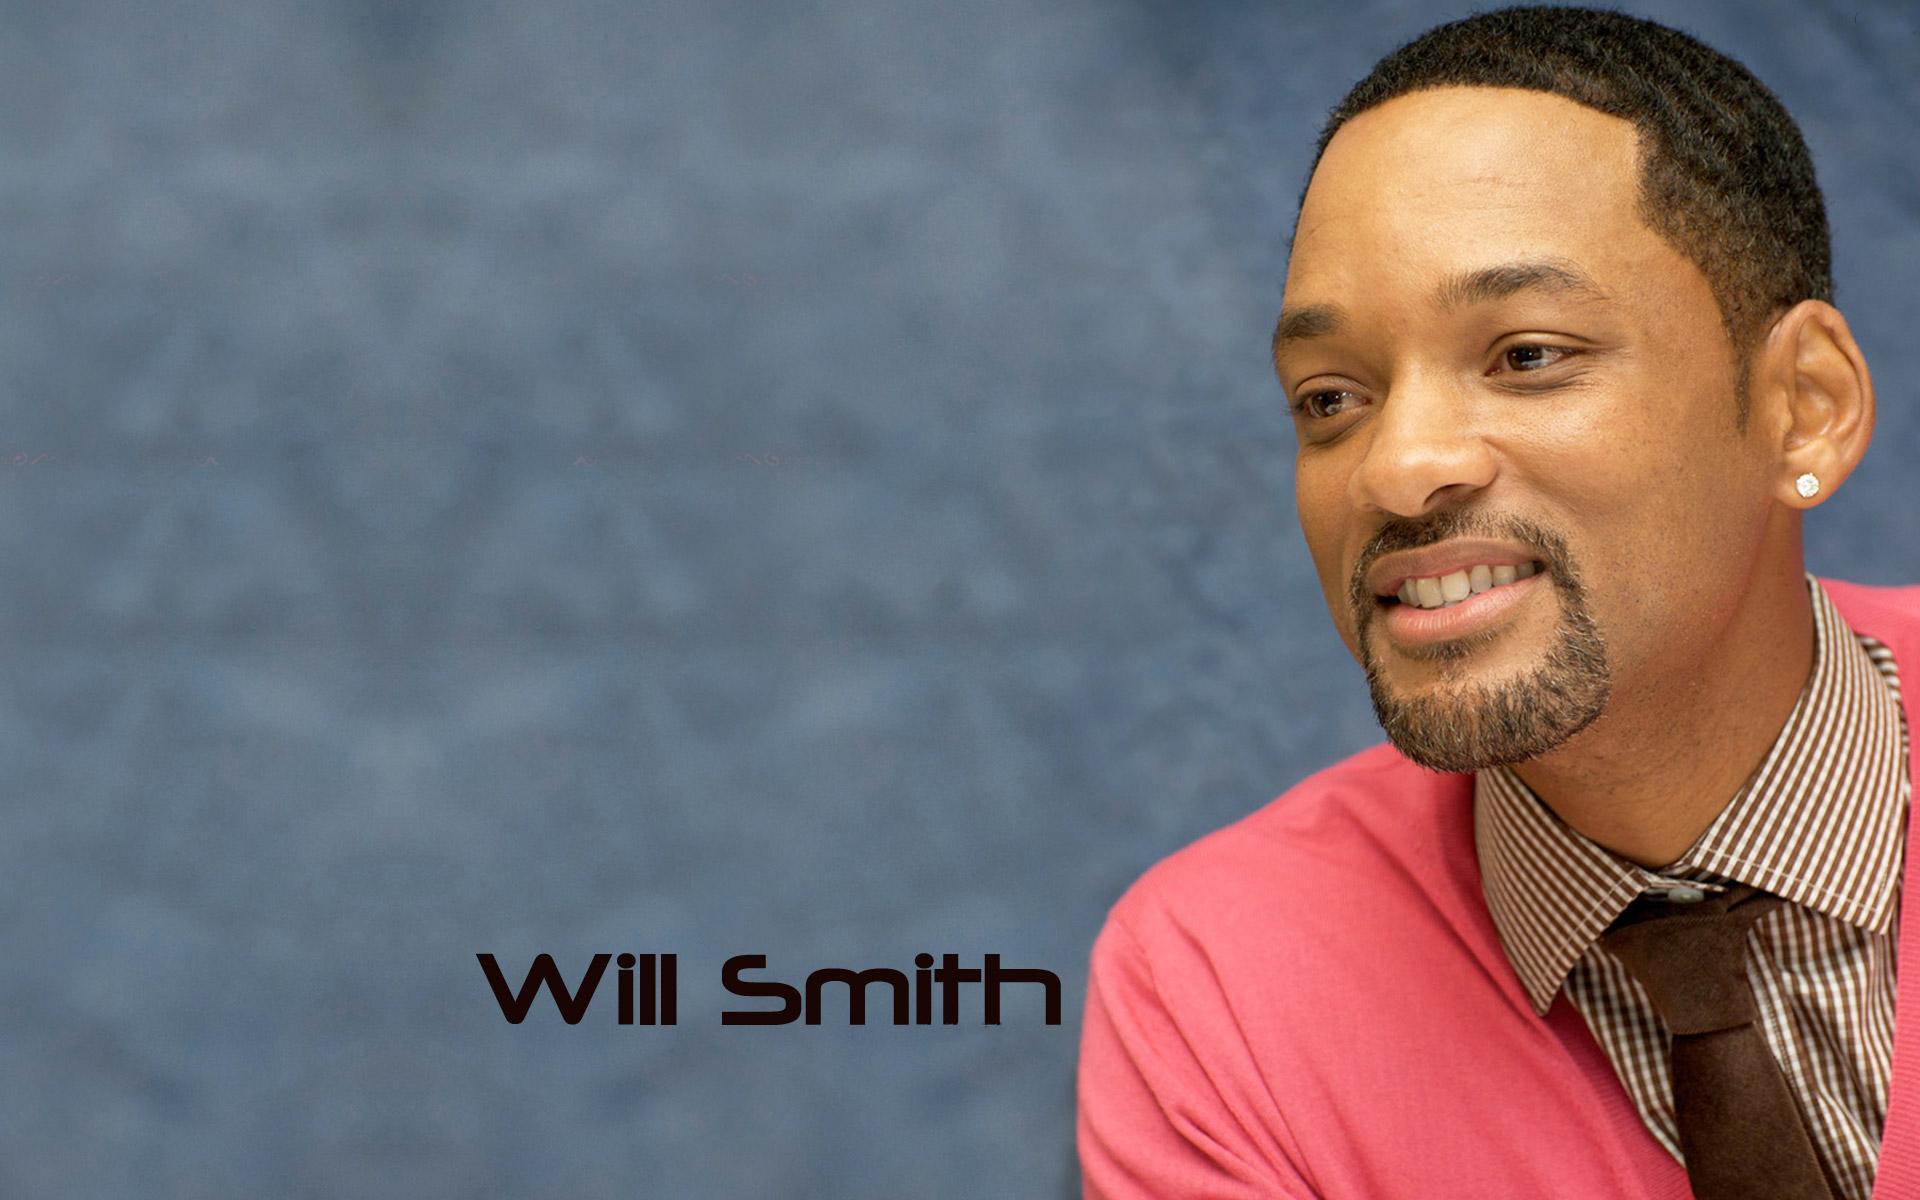 Will Smith Wallpaper 11